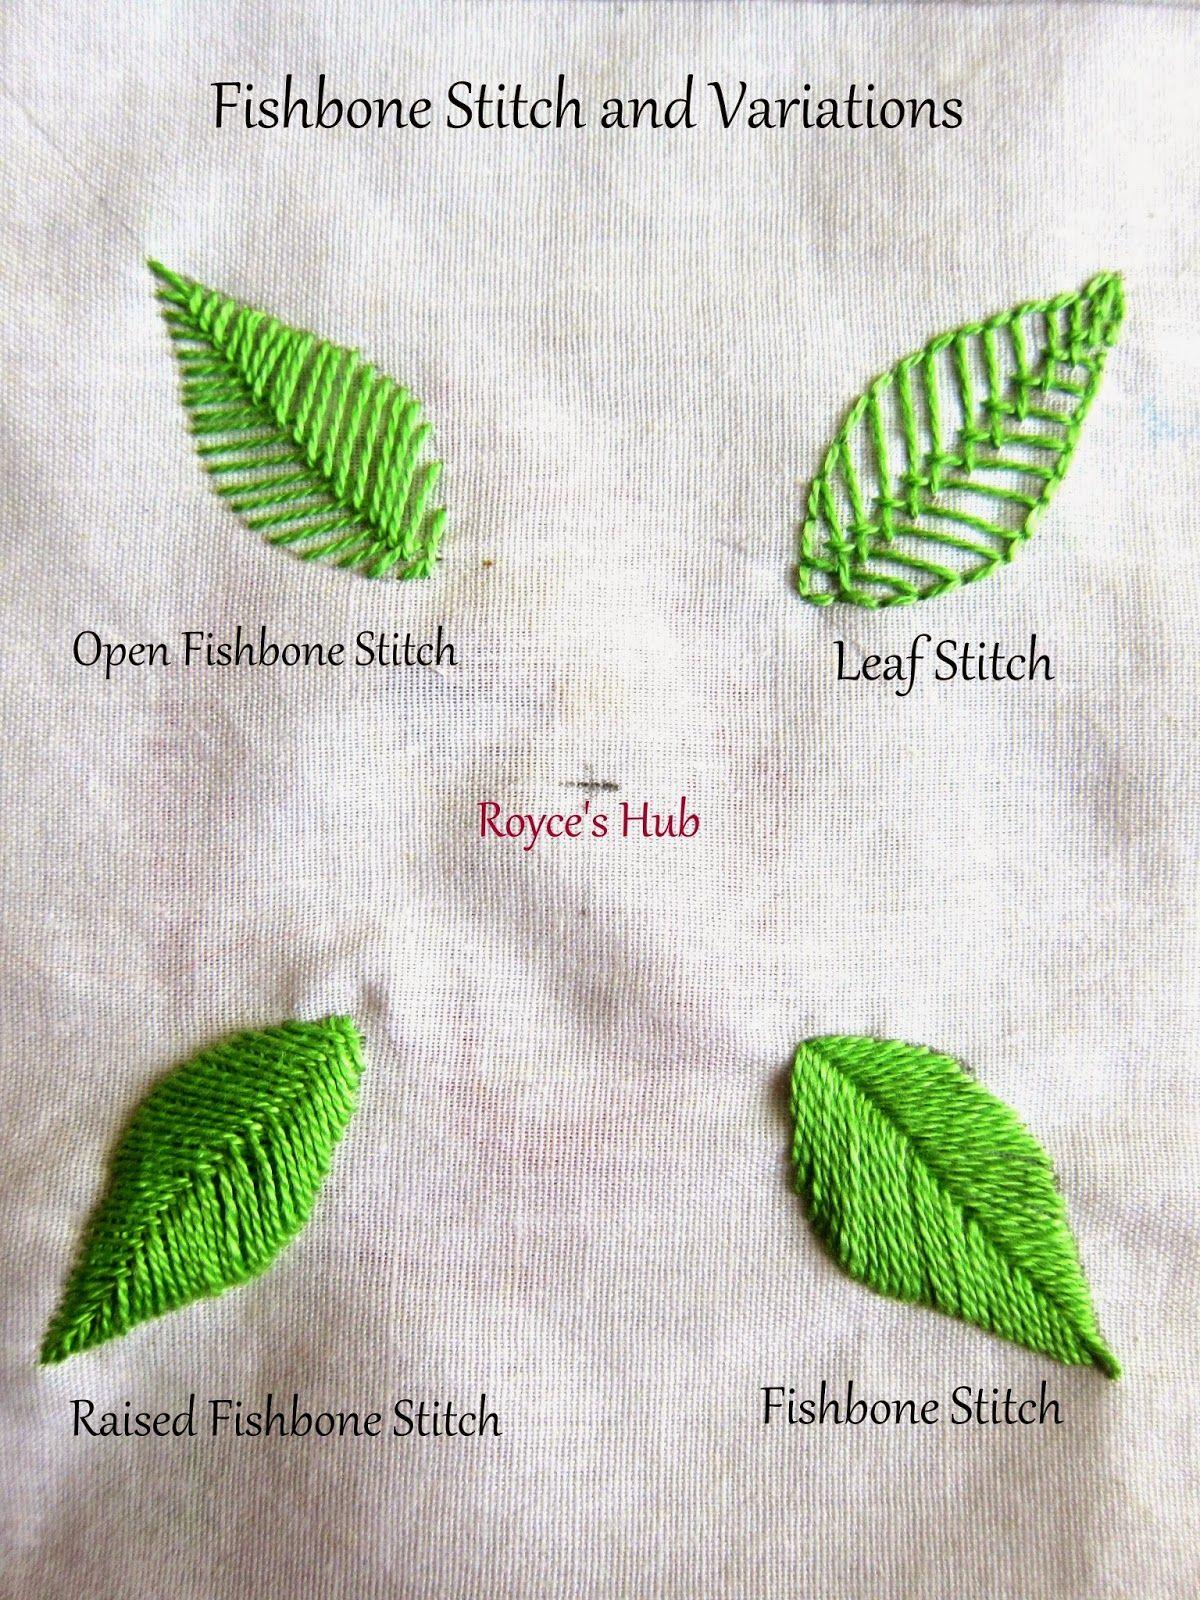 Leaf Stitch Tutorial : stitch, tutorial, Royce's, Embroidery, Stitches, Leaves, Fishbone, Stitch, Variations, Tutorial,, Leaf,